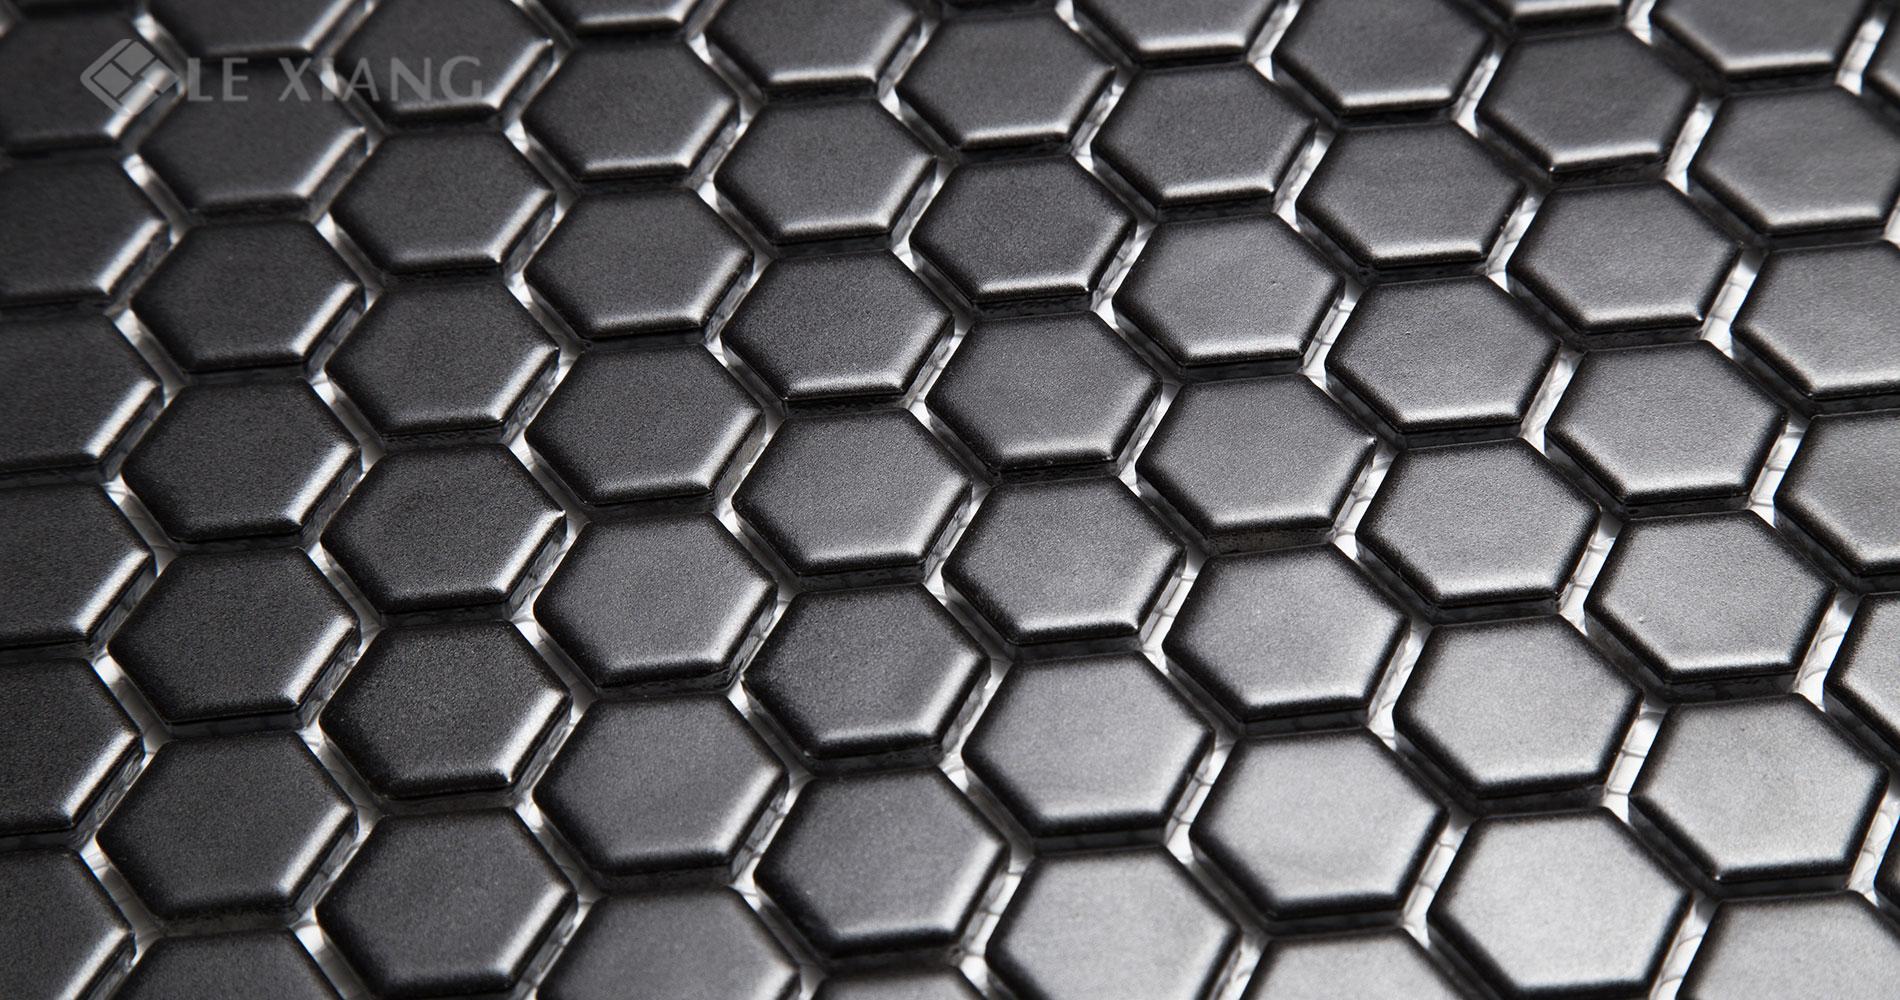 Porcelain-Hexagon-Mosaic-Tile-For-Bathroom-Wall-Flooring-Tiles-8